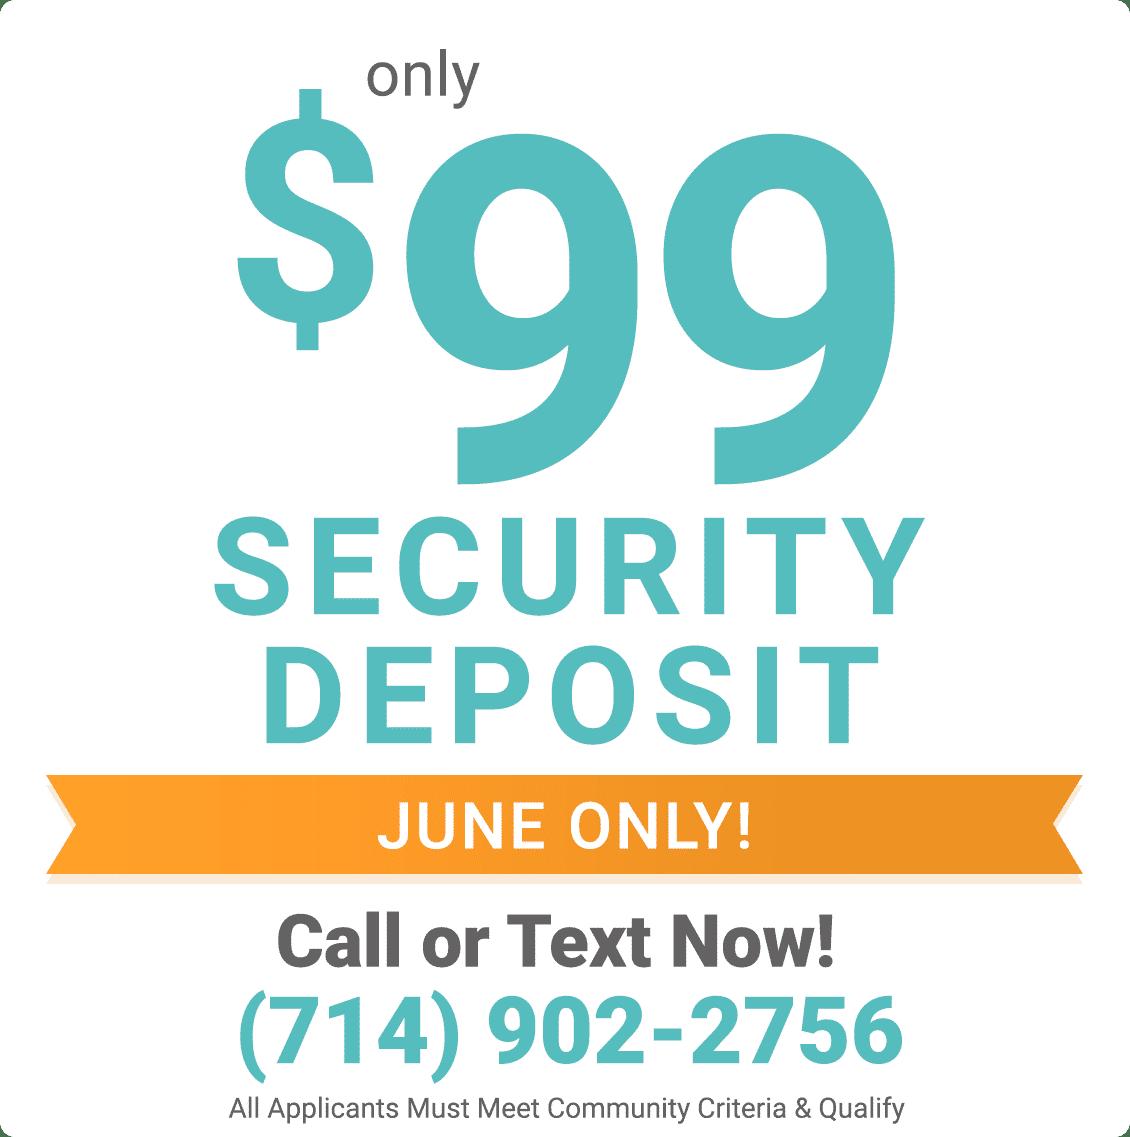 $99 security deposit during June